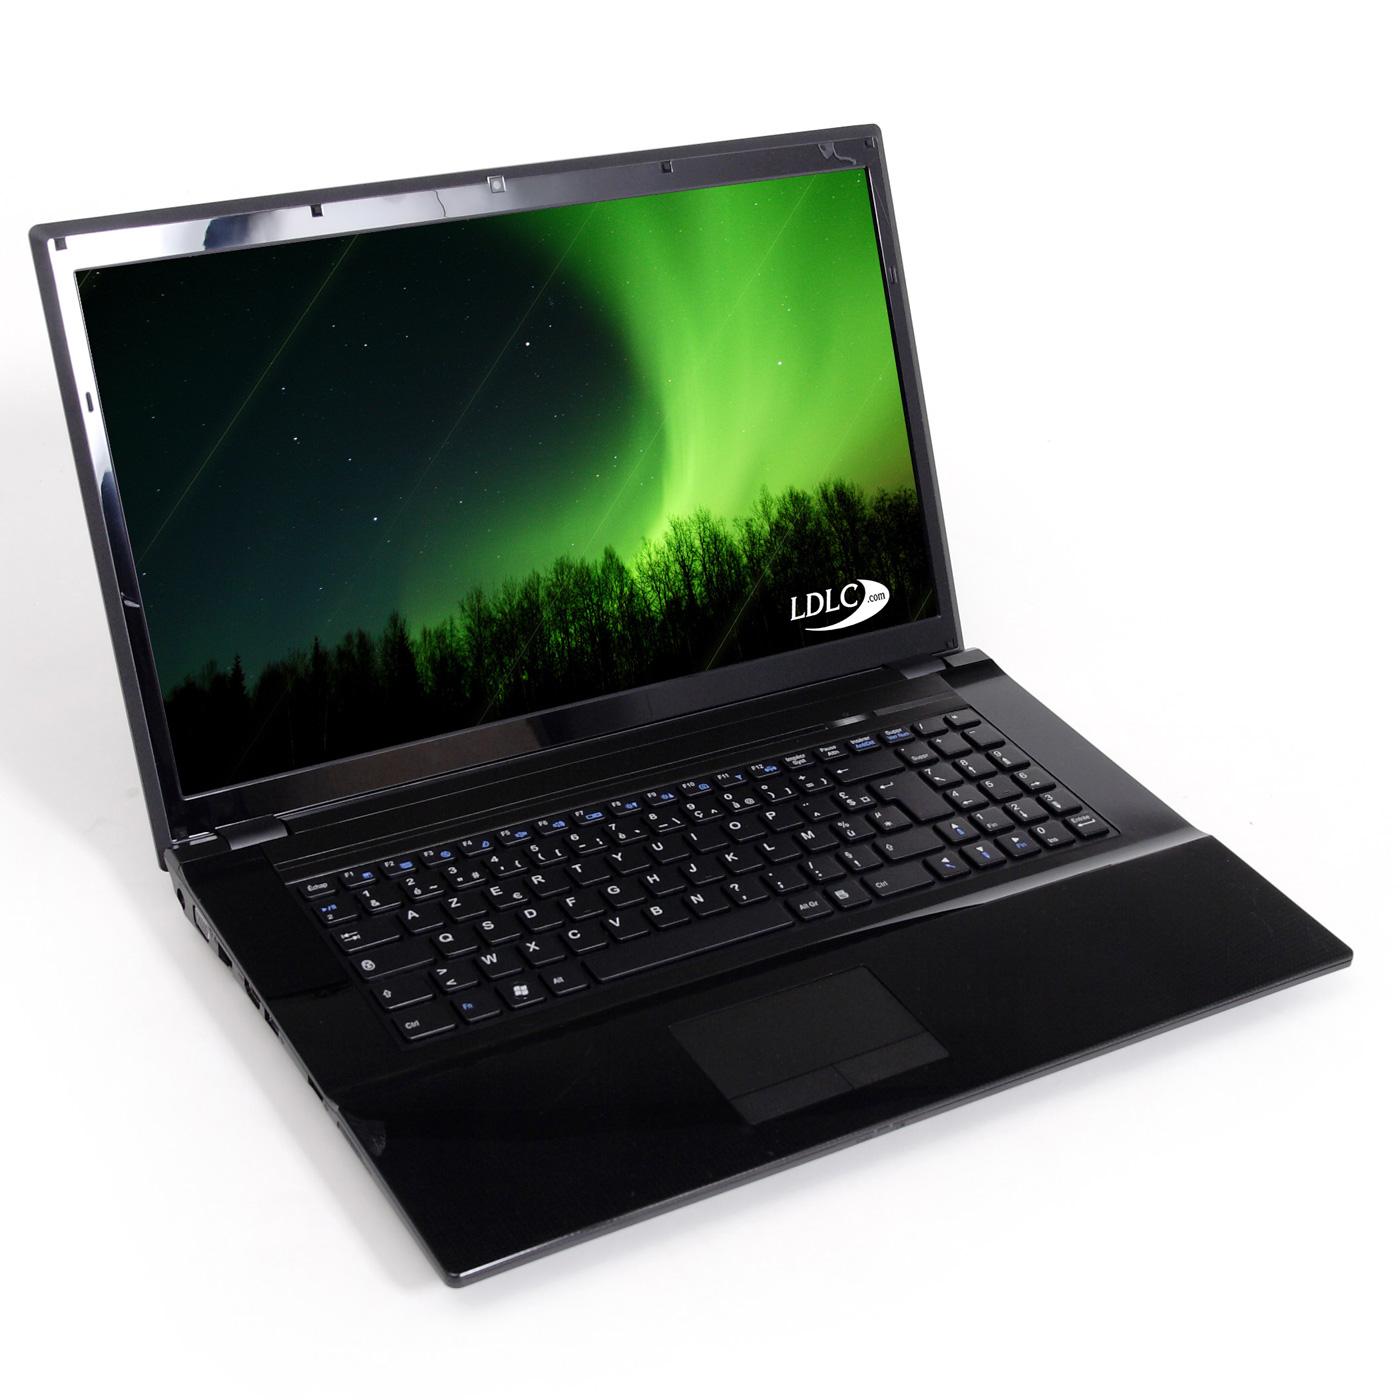 "PC portable LDLC Aurore BG2-I3-4-H5 Intel Core i3-2350M 4 Go 500 Go 17.3"" LED Lecteur Blu-ray / Graveur DVD Wi-Fi N/Bluetooth Webcam (sans OS)"